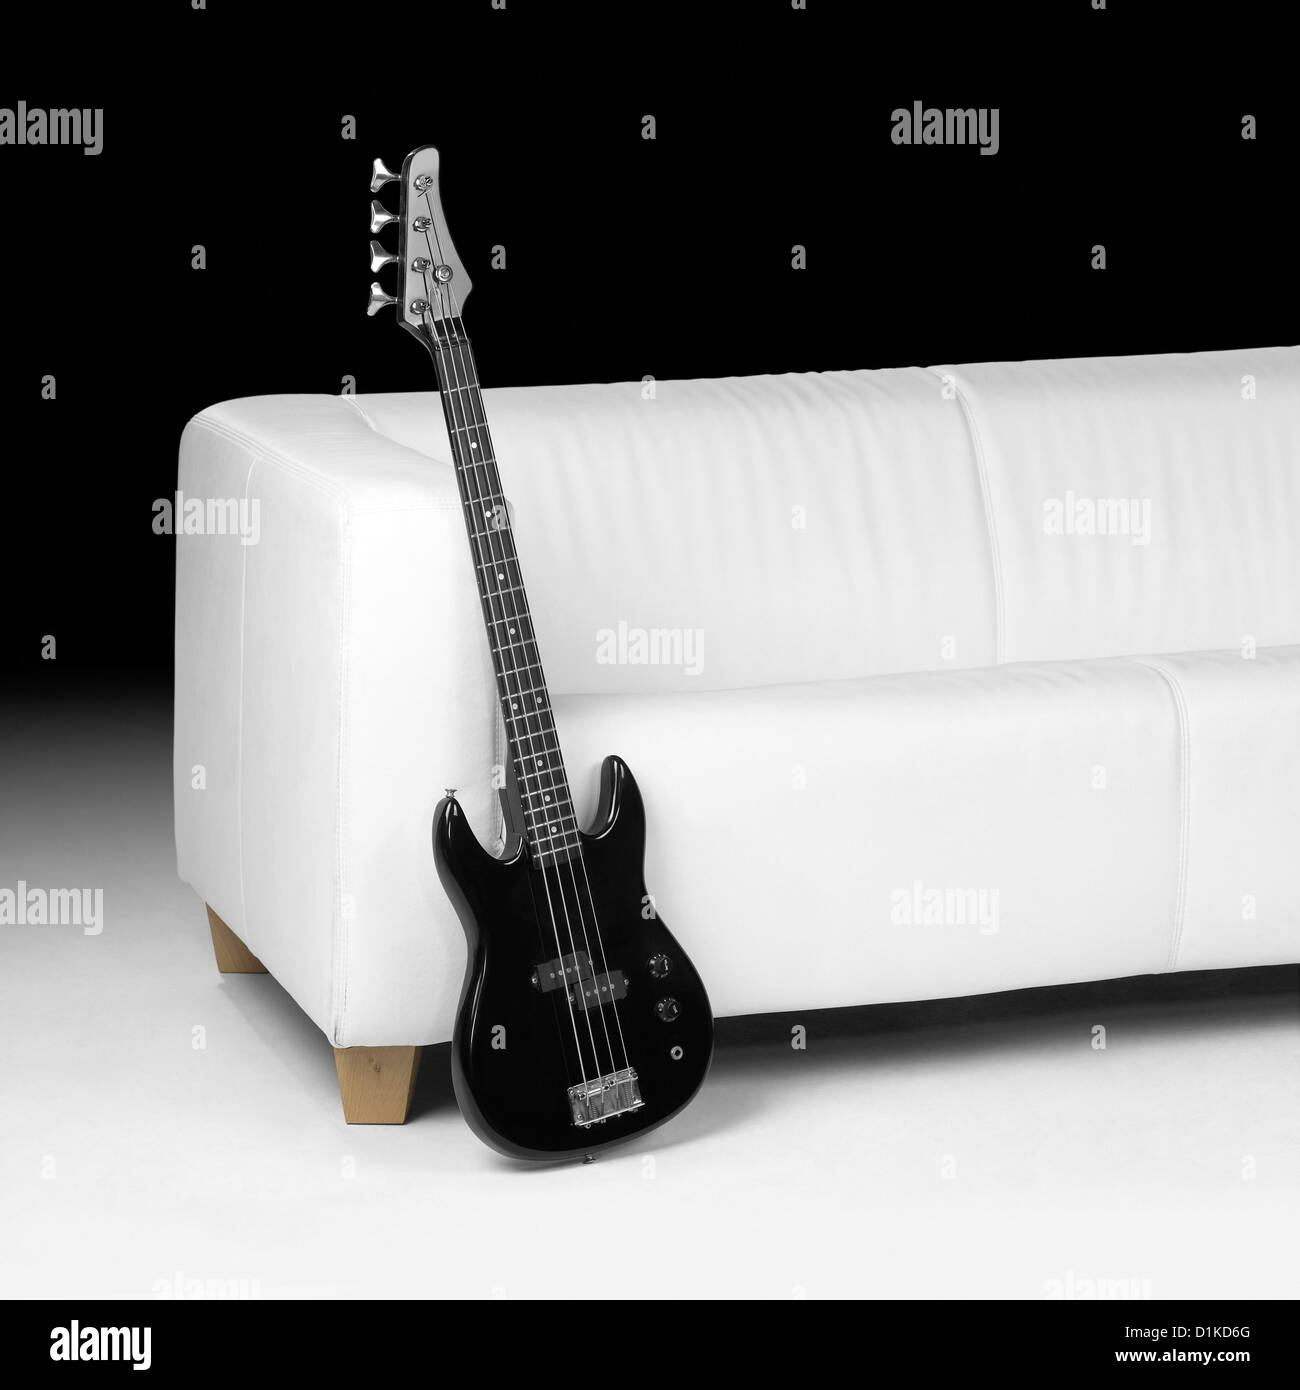 Black Bass Guitar Lean Against White Couch In Dark Back